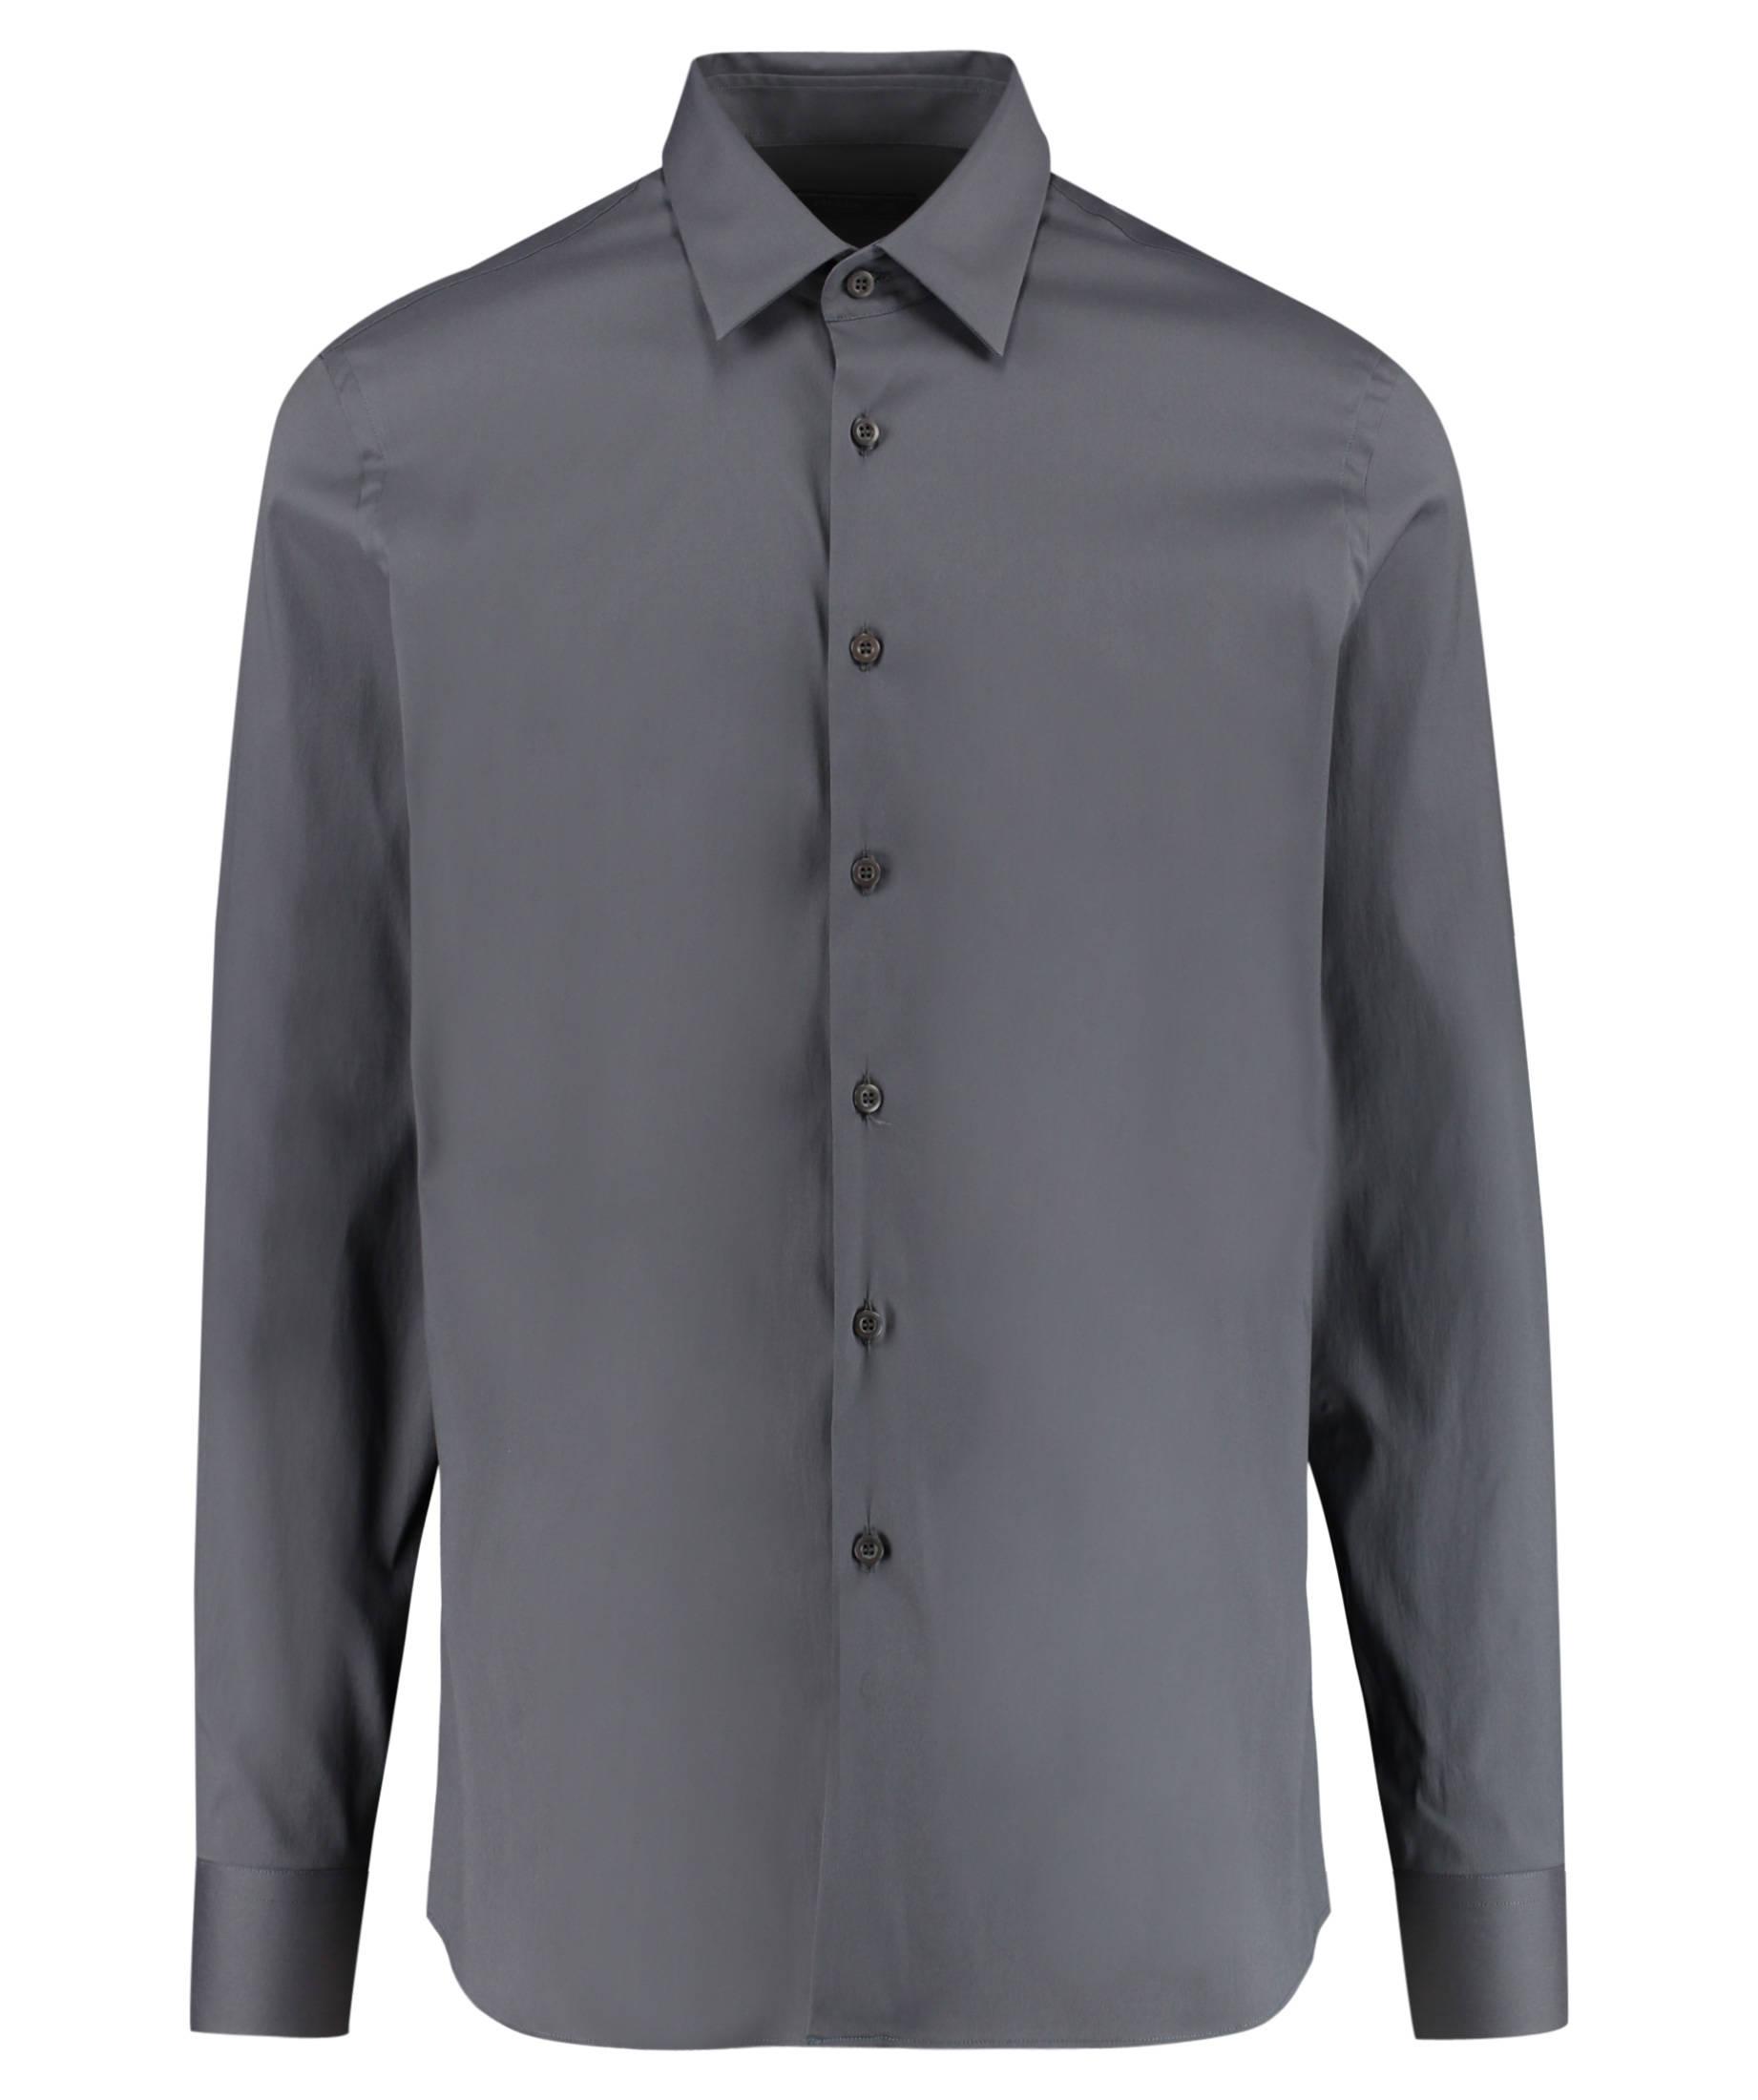 akzeptabler Preis großer Abverkauf heiße Produkte Herren Hemd Slim Fit Langarm